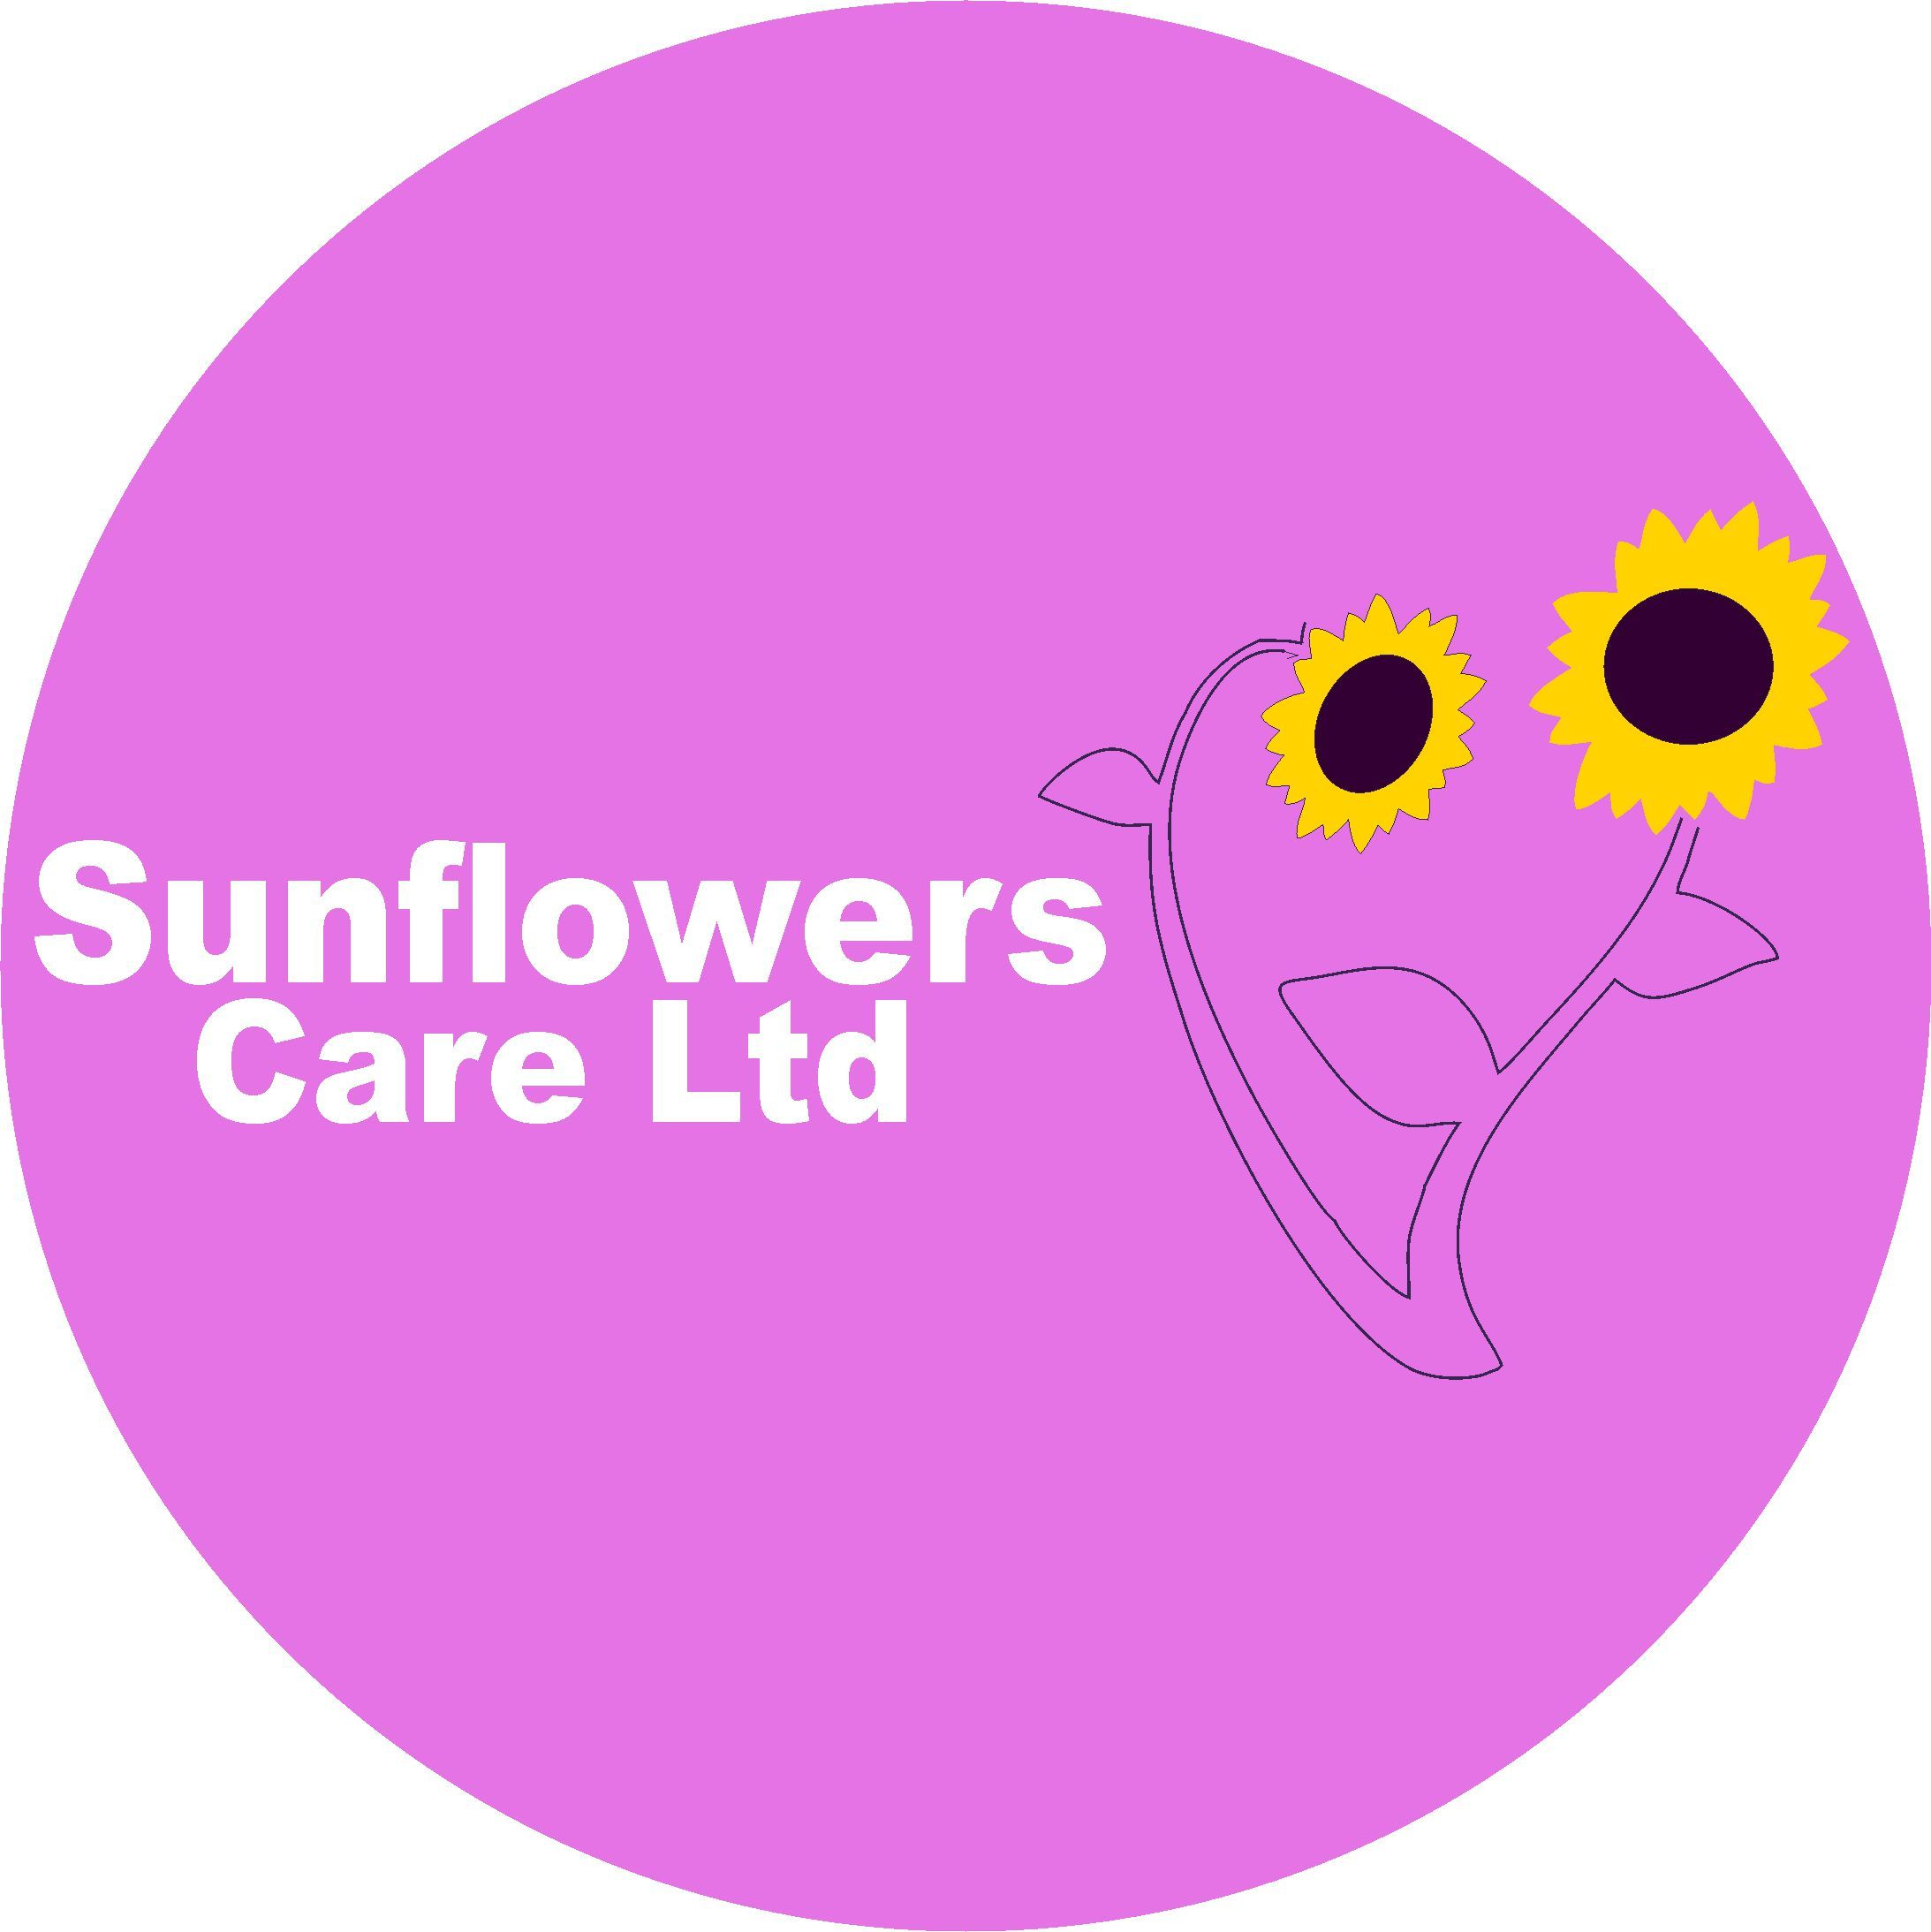 Karen Higgins- Sunflowers Care